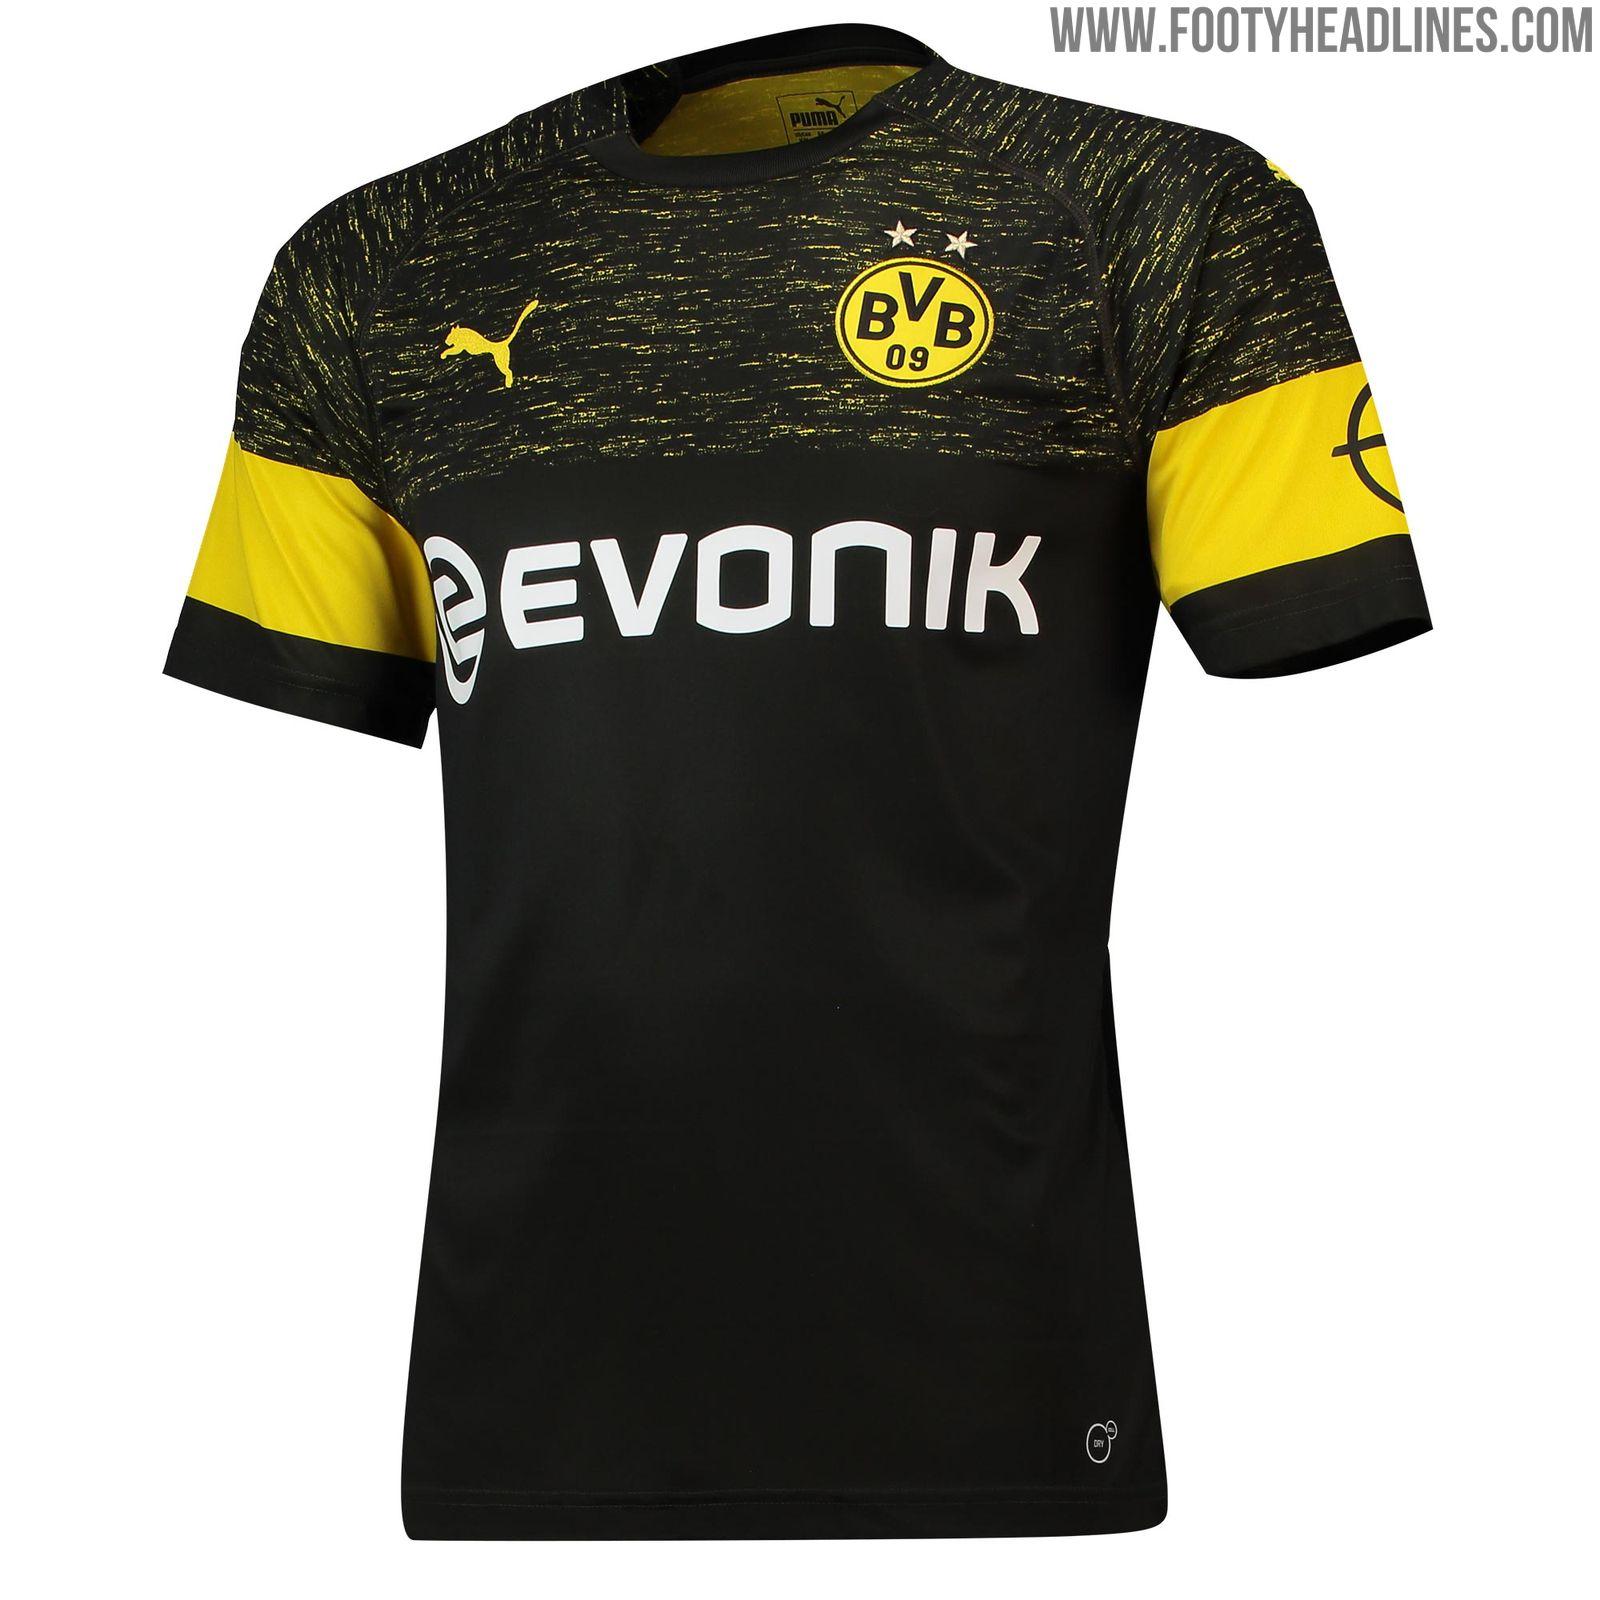 Borussia Dortmund 18-19 Away Kit Released